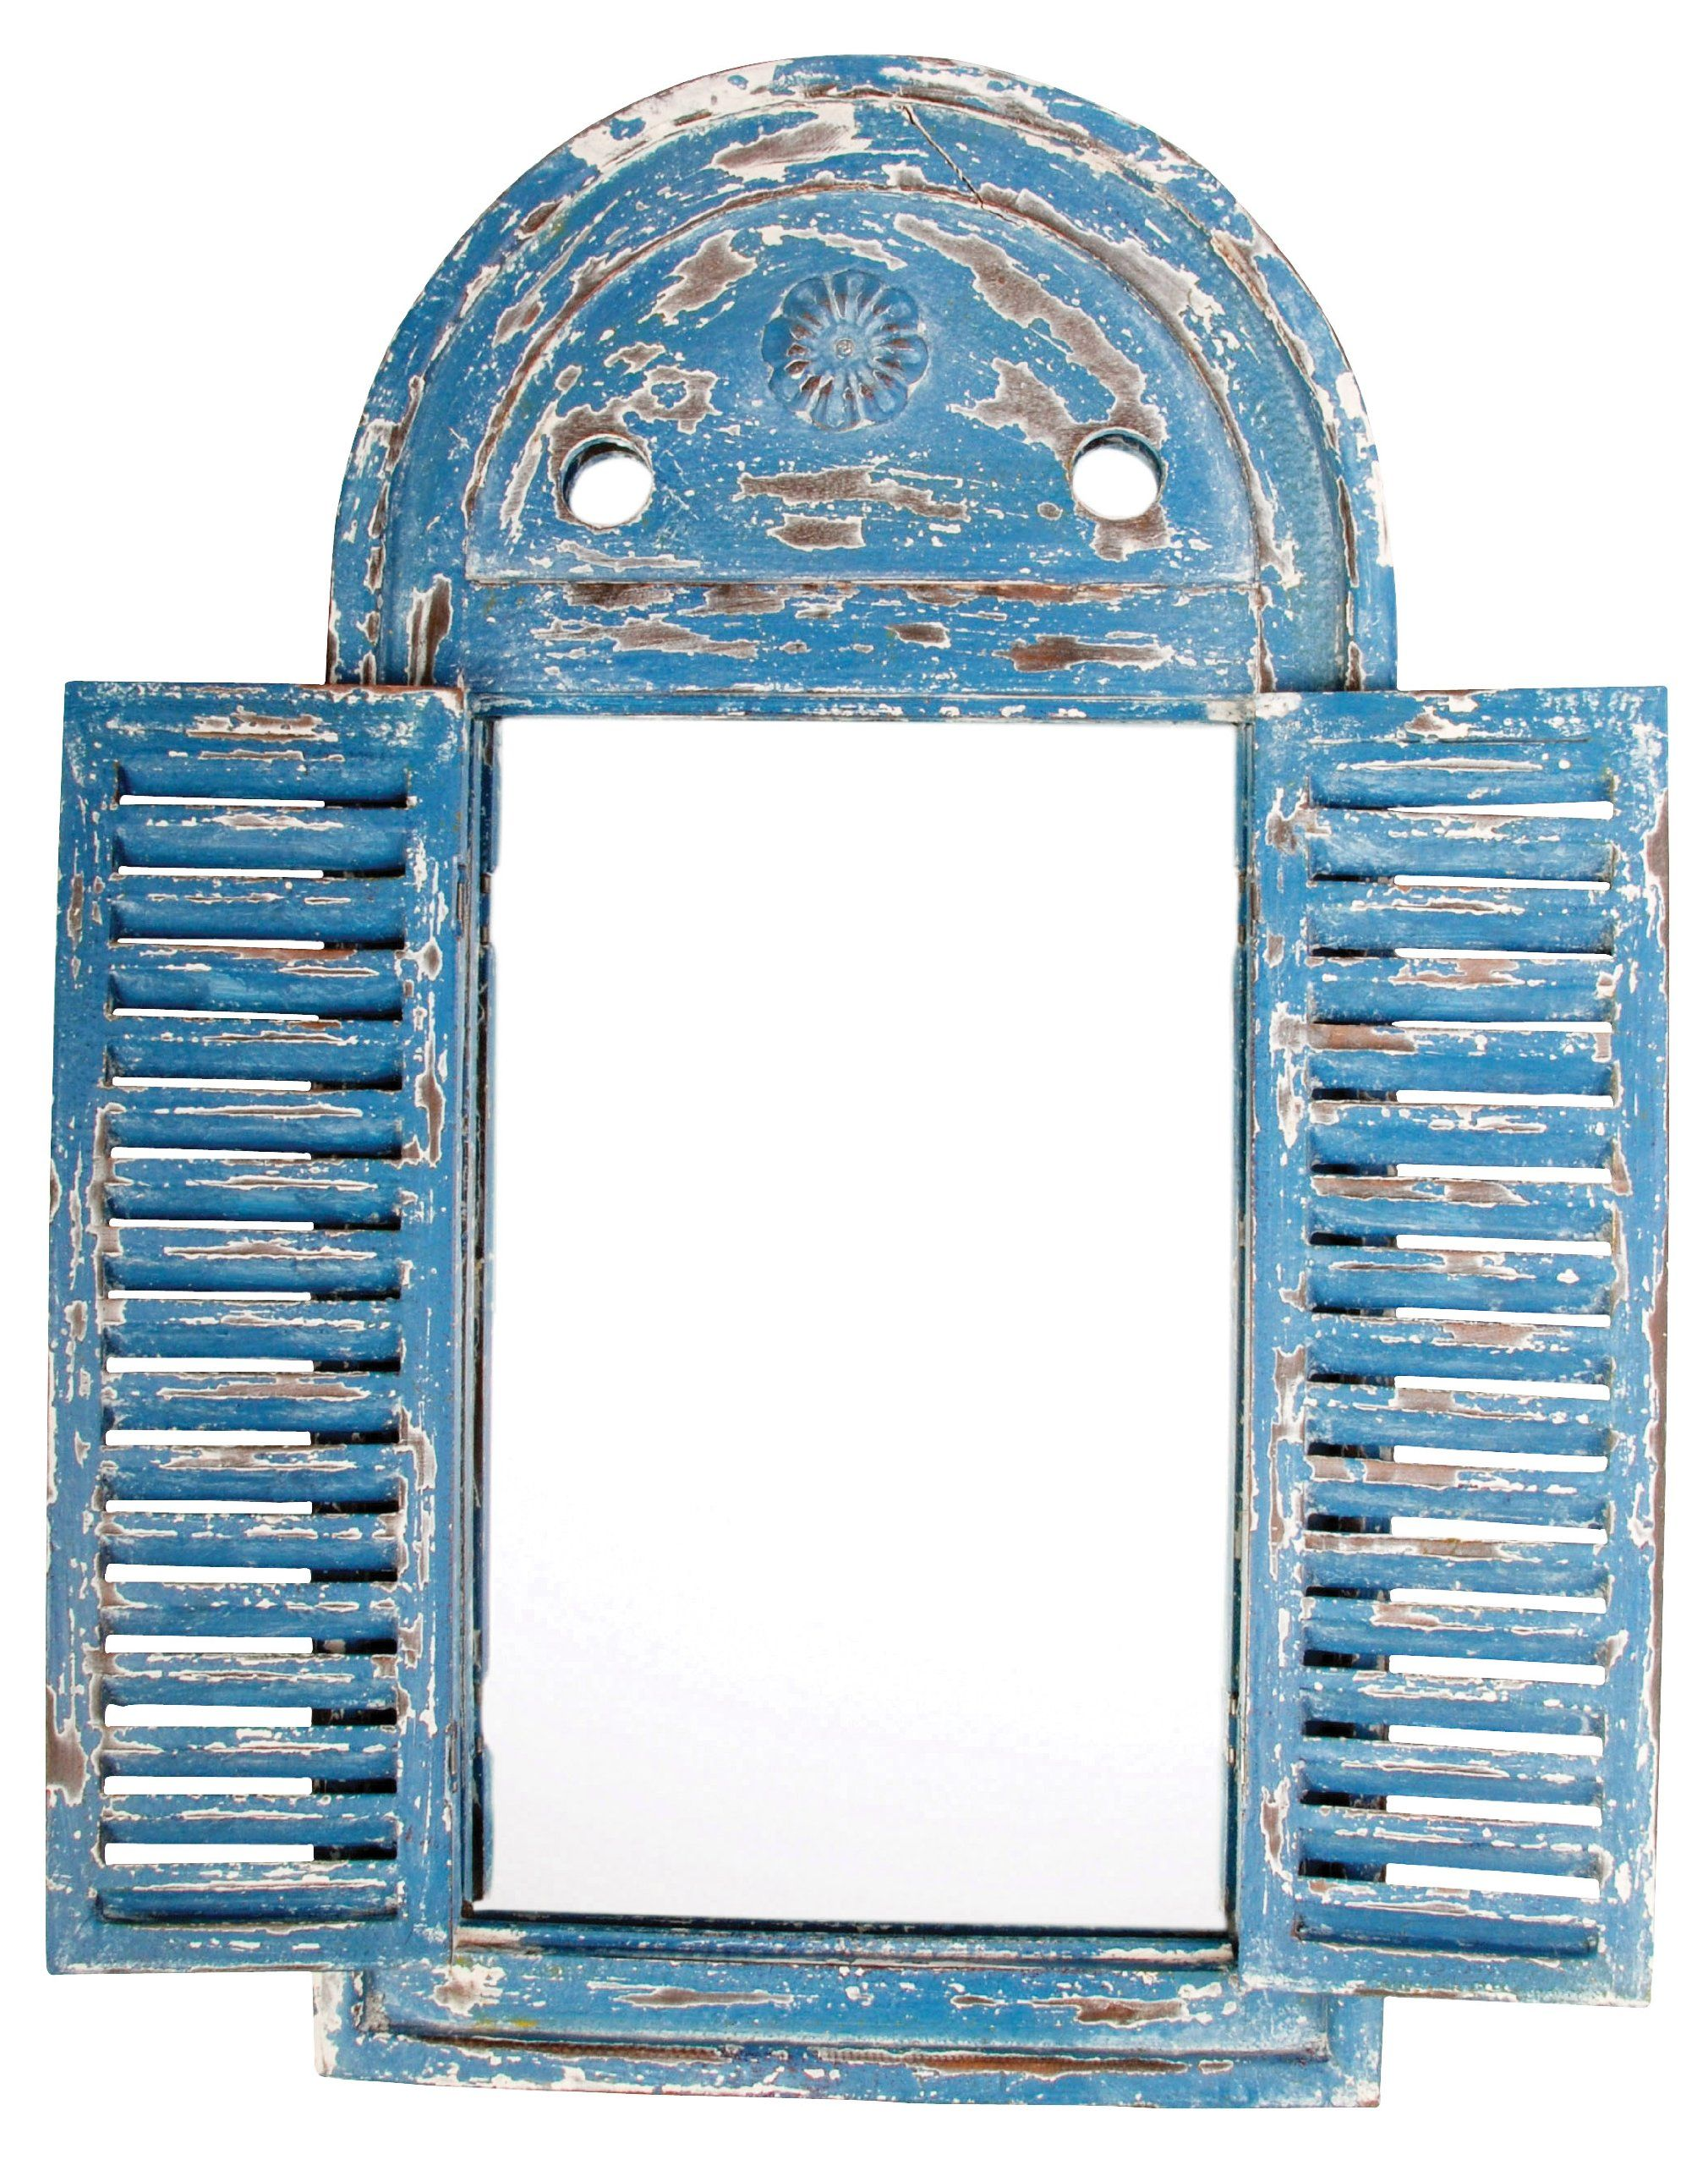 Amazon.com : Esschert Design WD13 Mirror Louvre Distressed, Blue ...